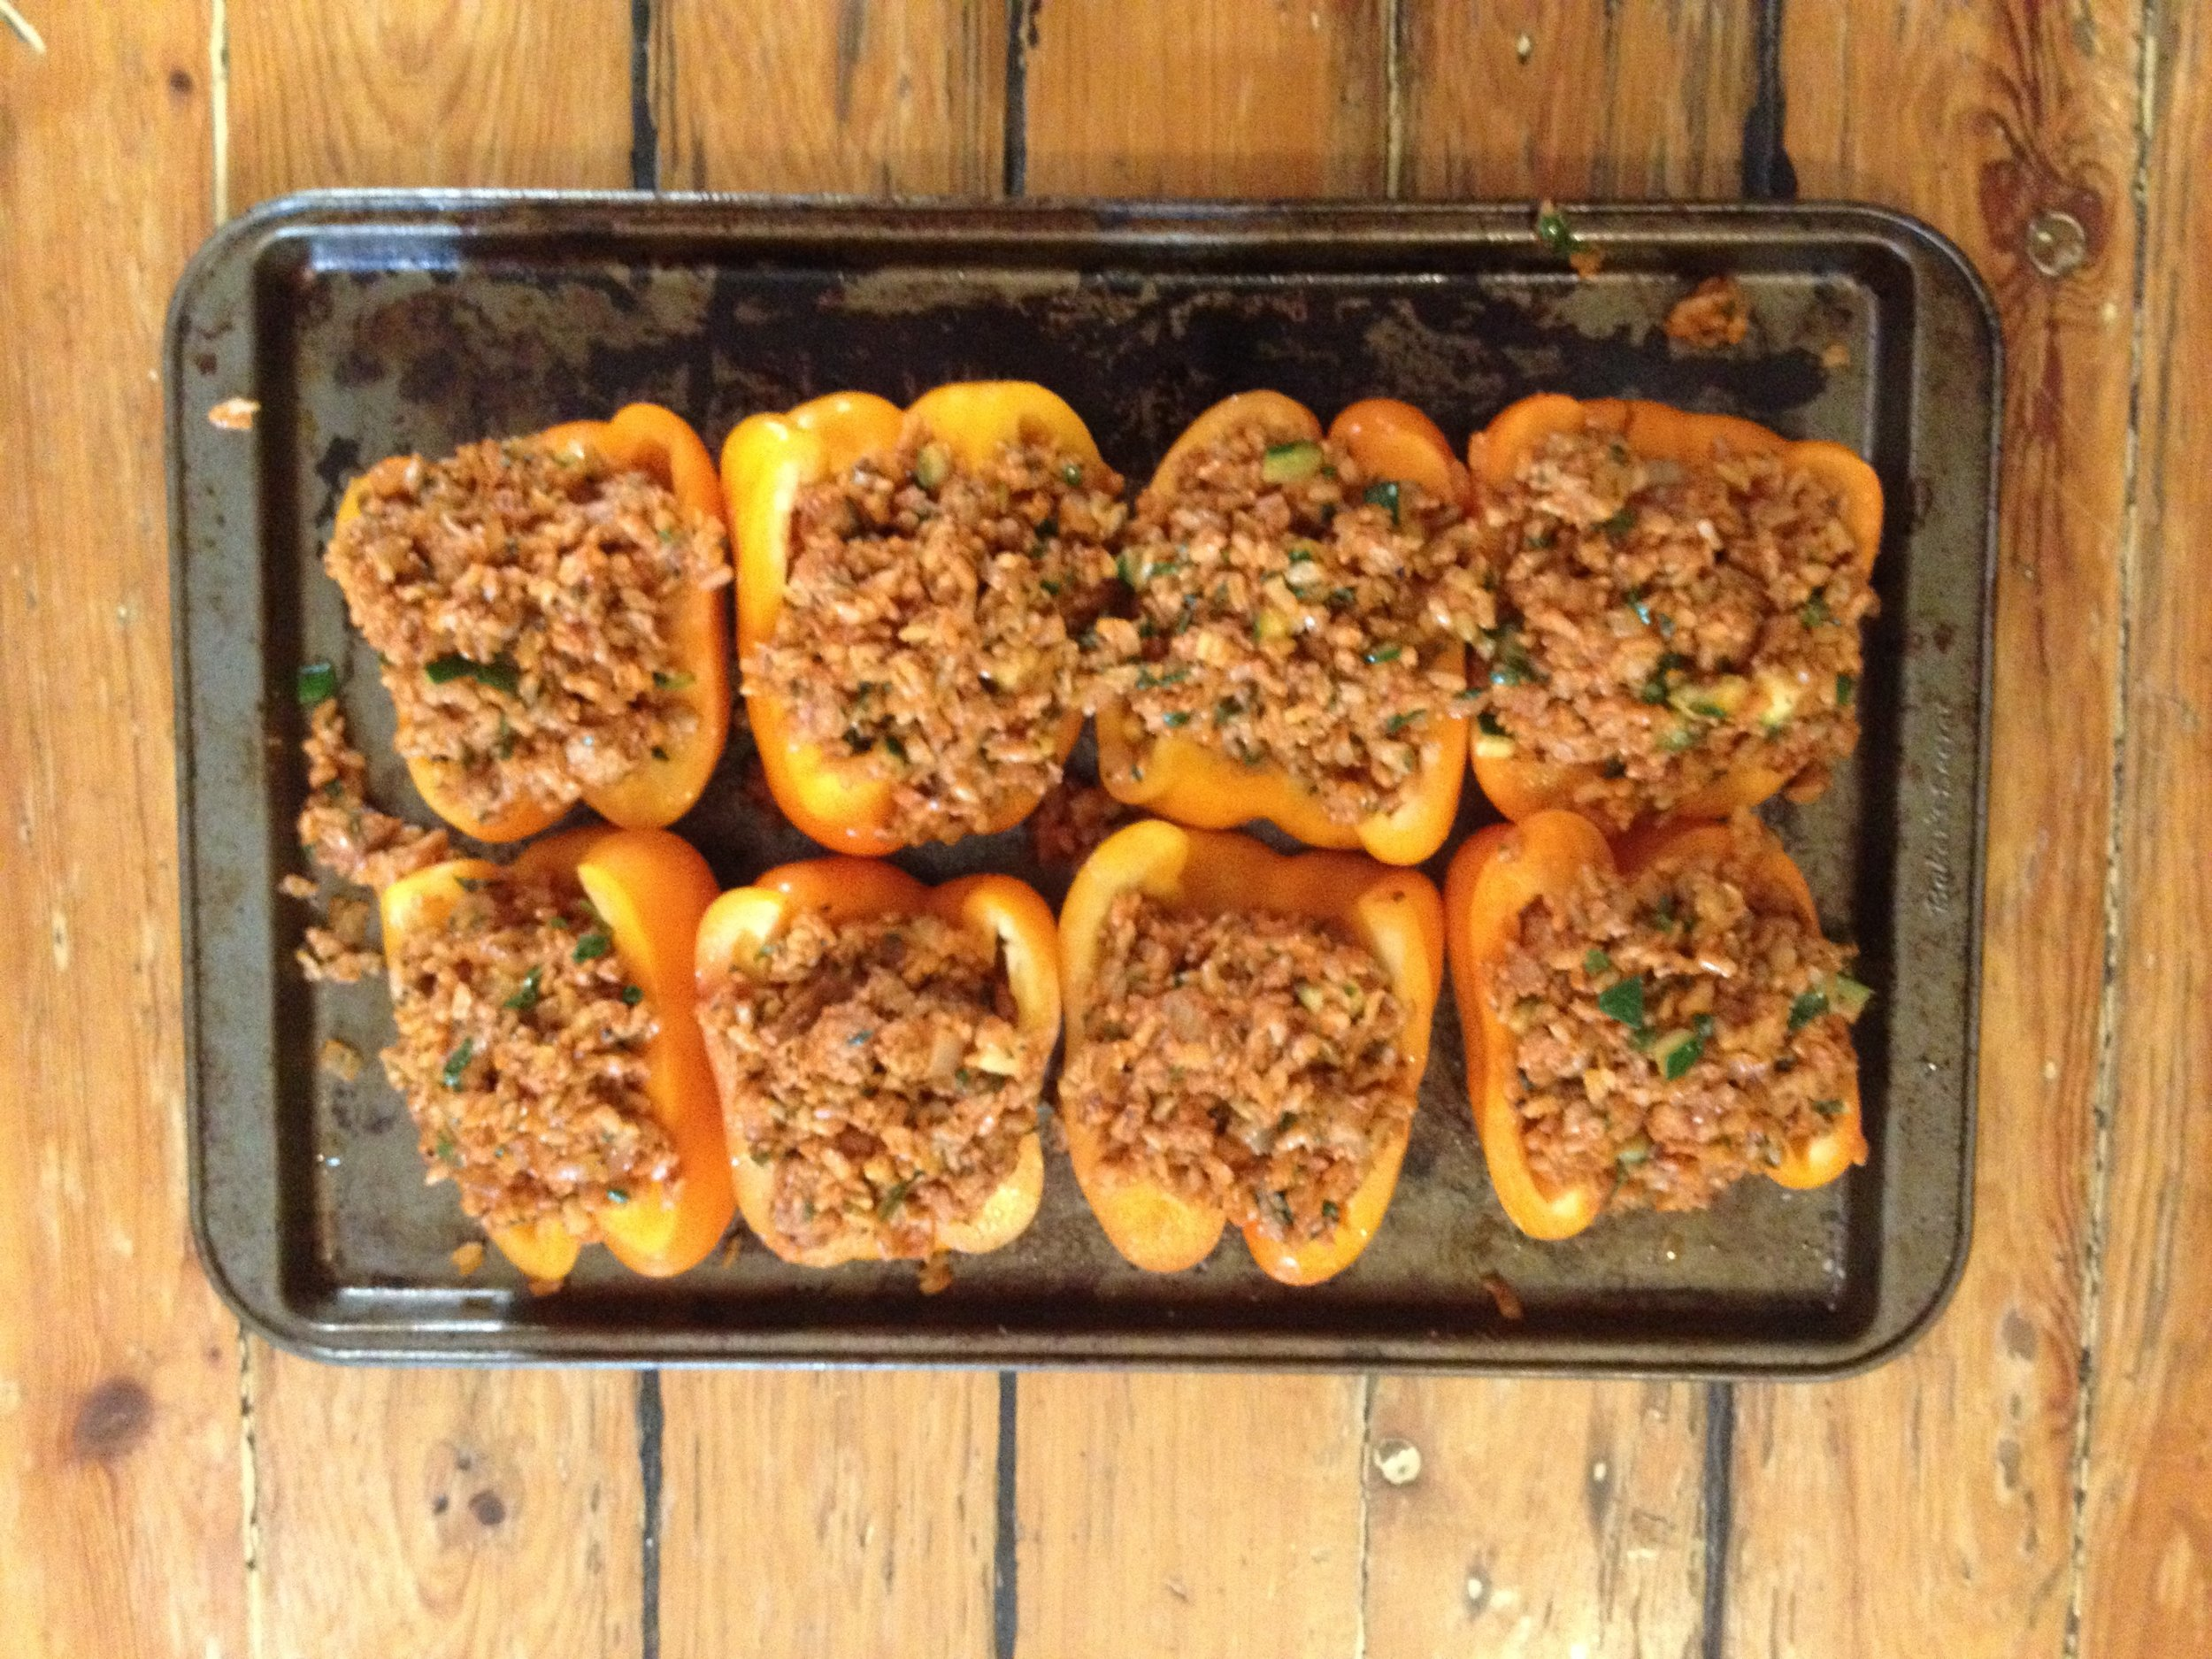 peppers_ready-1024x768.jpg